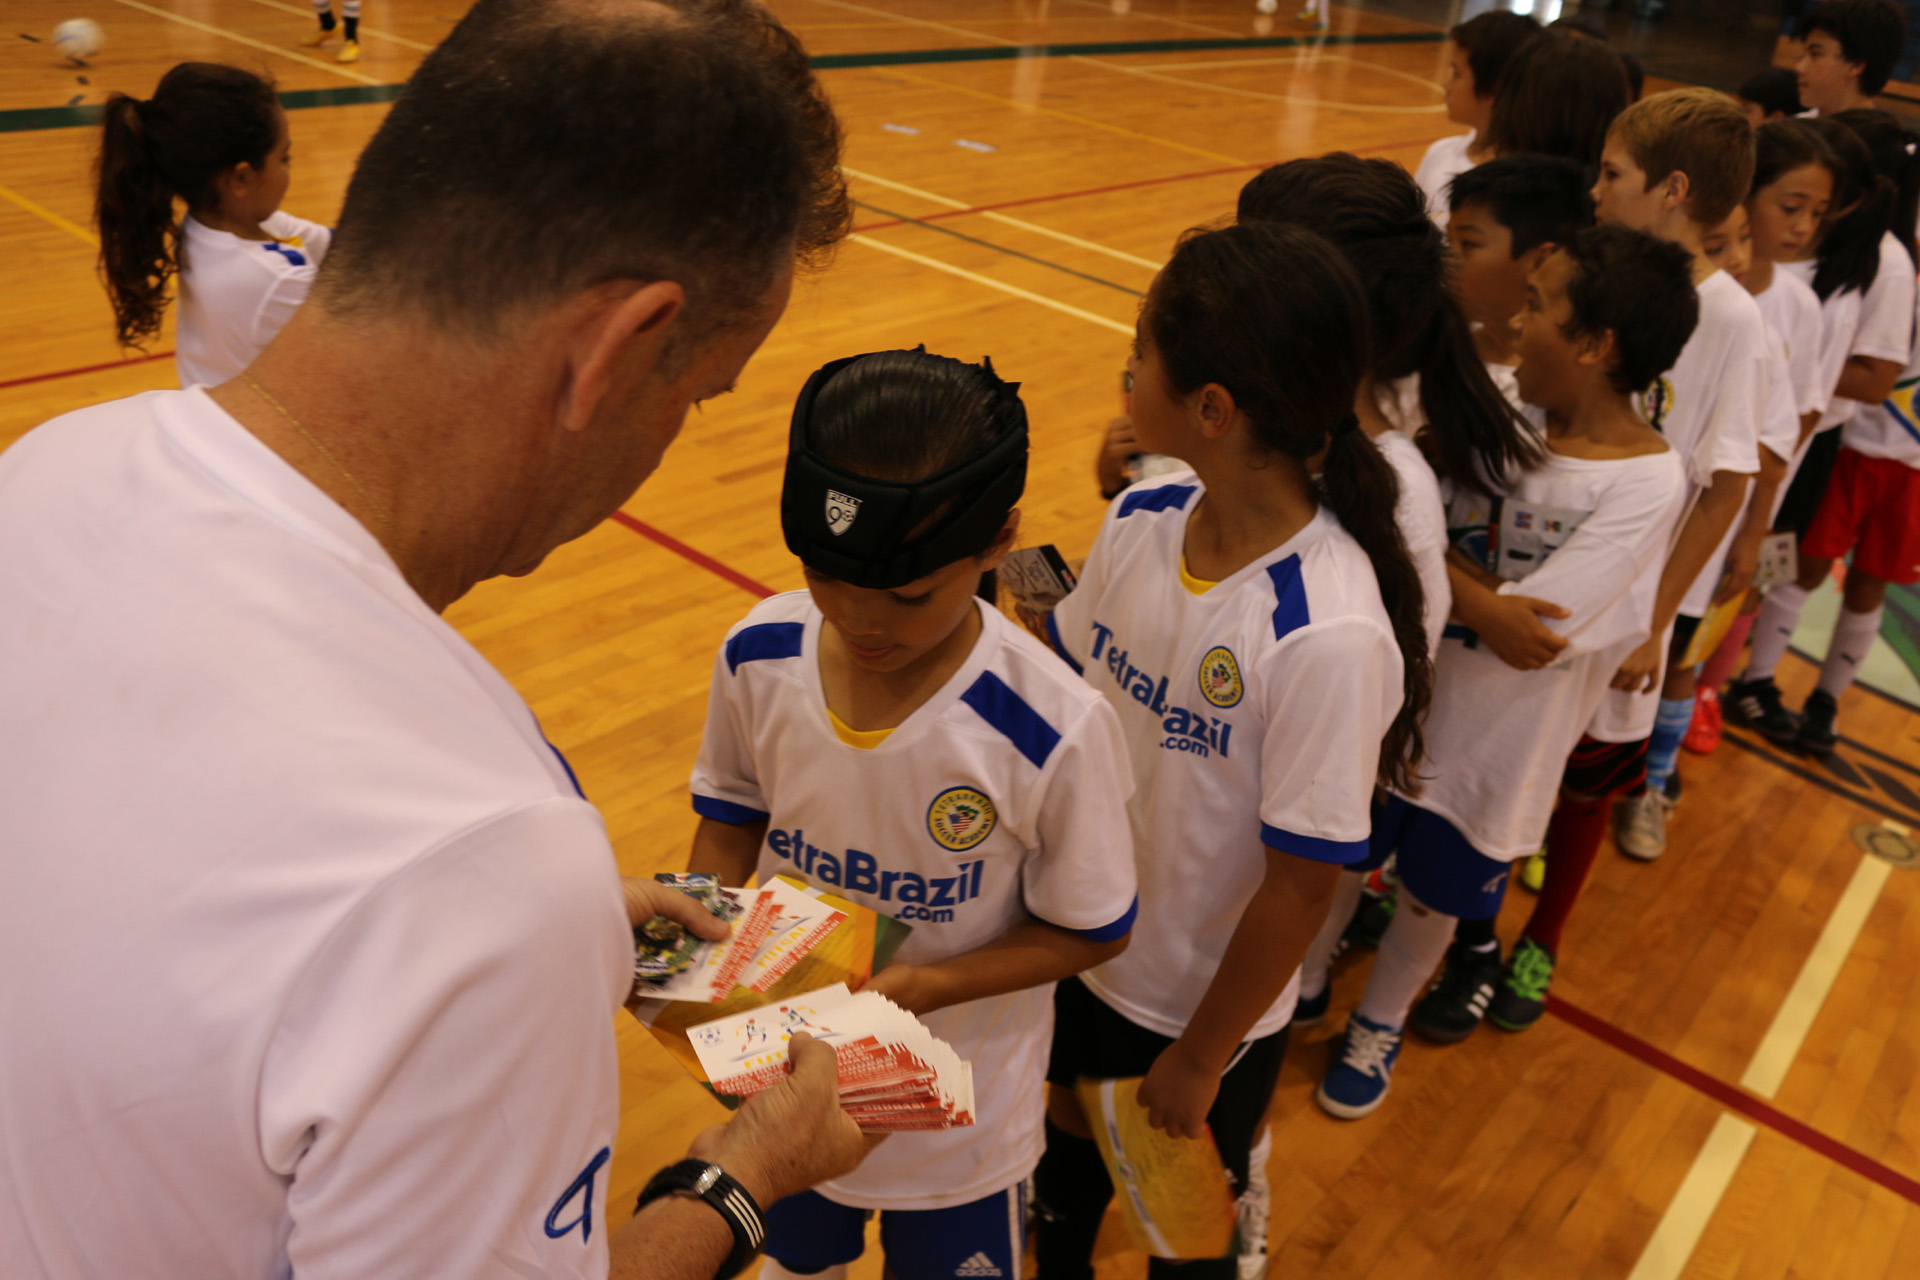 Kauai Camp - 2019 information coming soon!